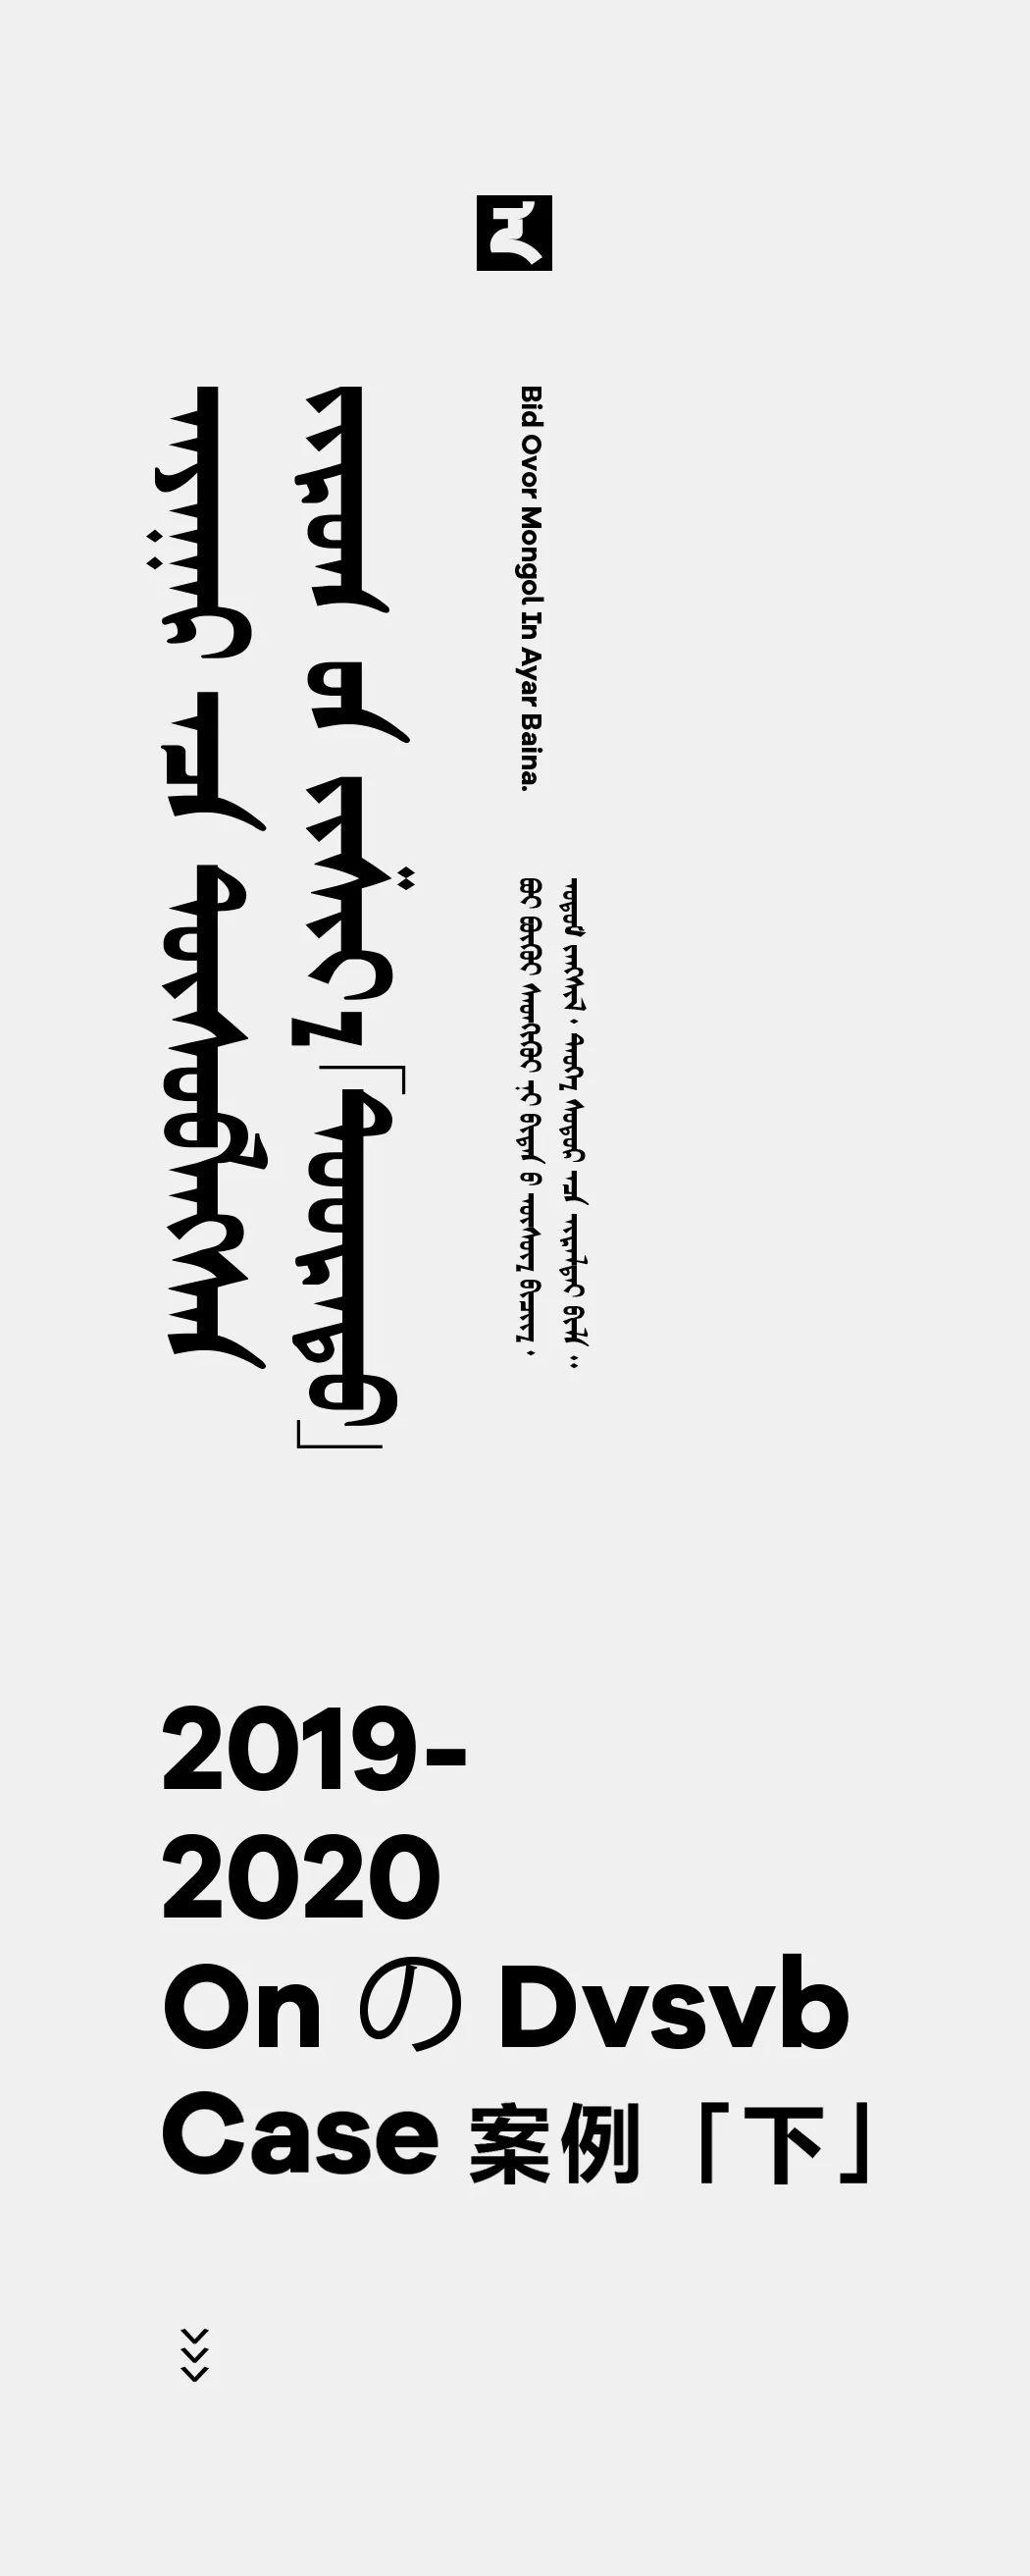 Ayar in 2019-2020 On の Dvsvb (下)